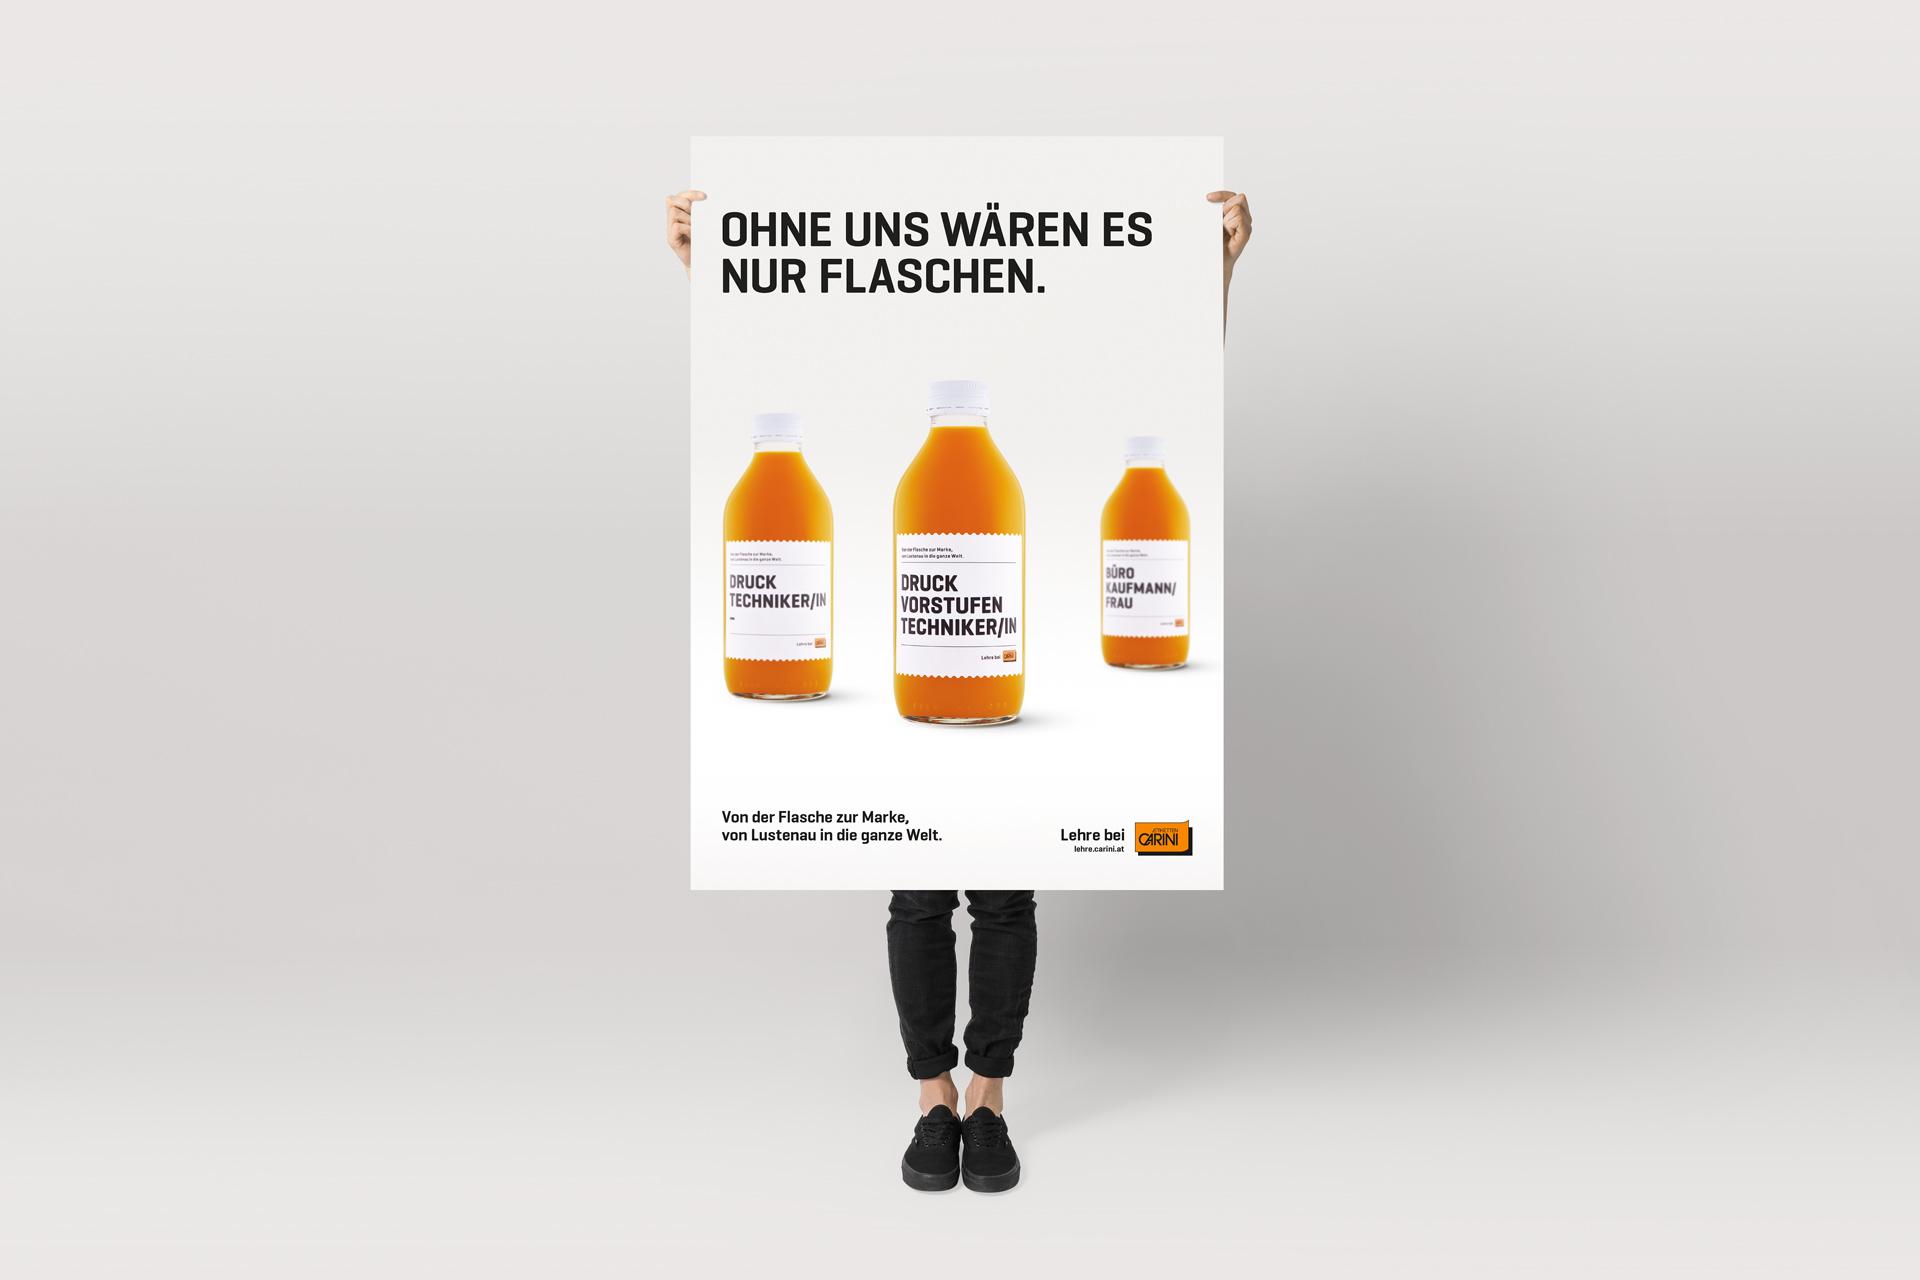 Etiketten CARINI, Plakat, Bernhard Hafele, viergestalten